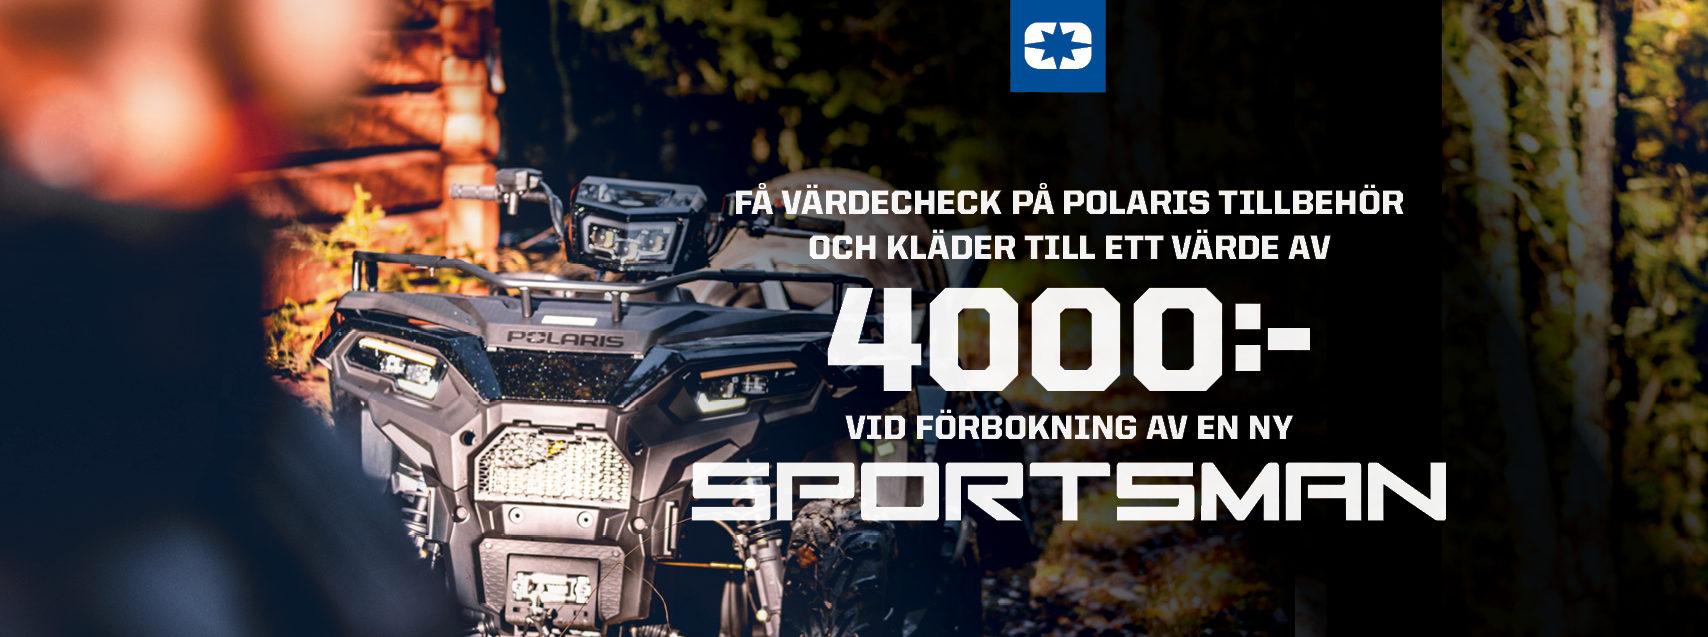 Sportsman Värdecheck